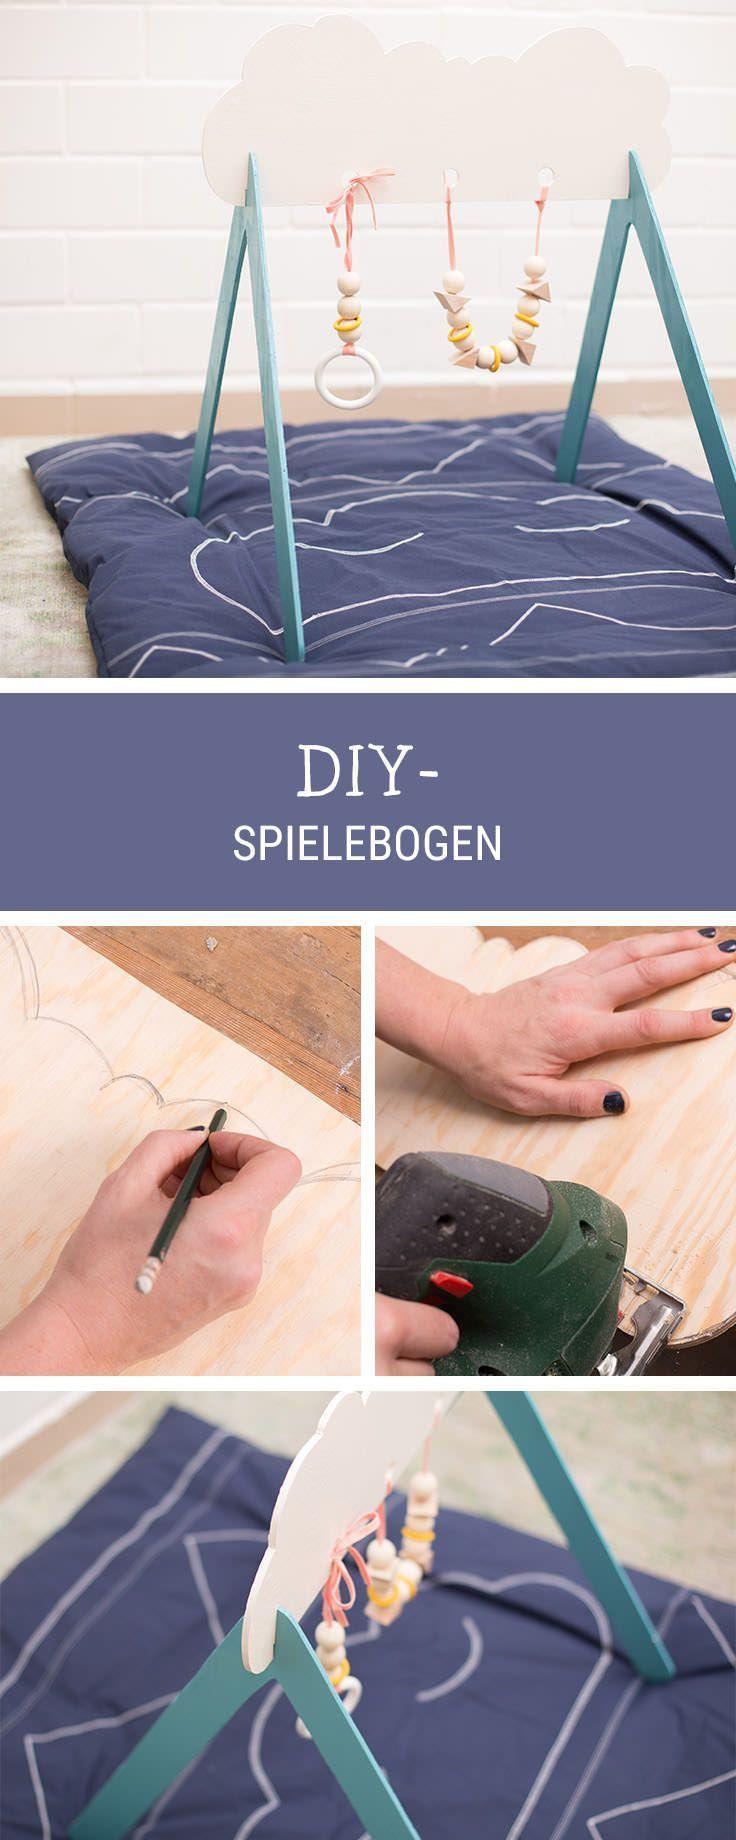 DIY Anleitung Spielebogen aus Holz selber machen via DaWanda